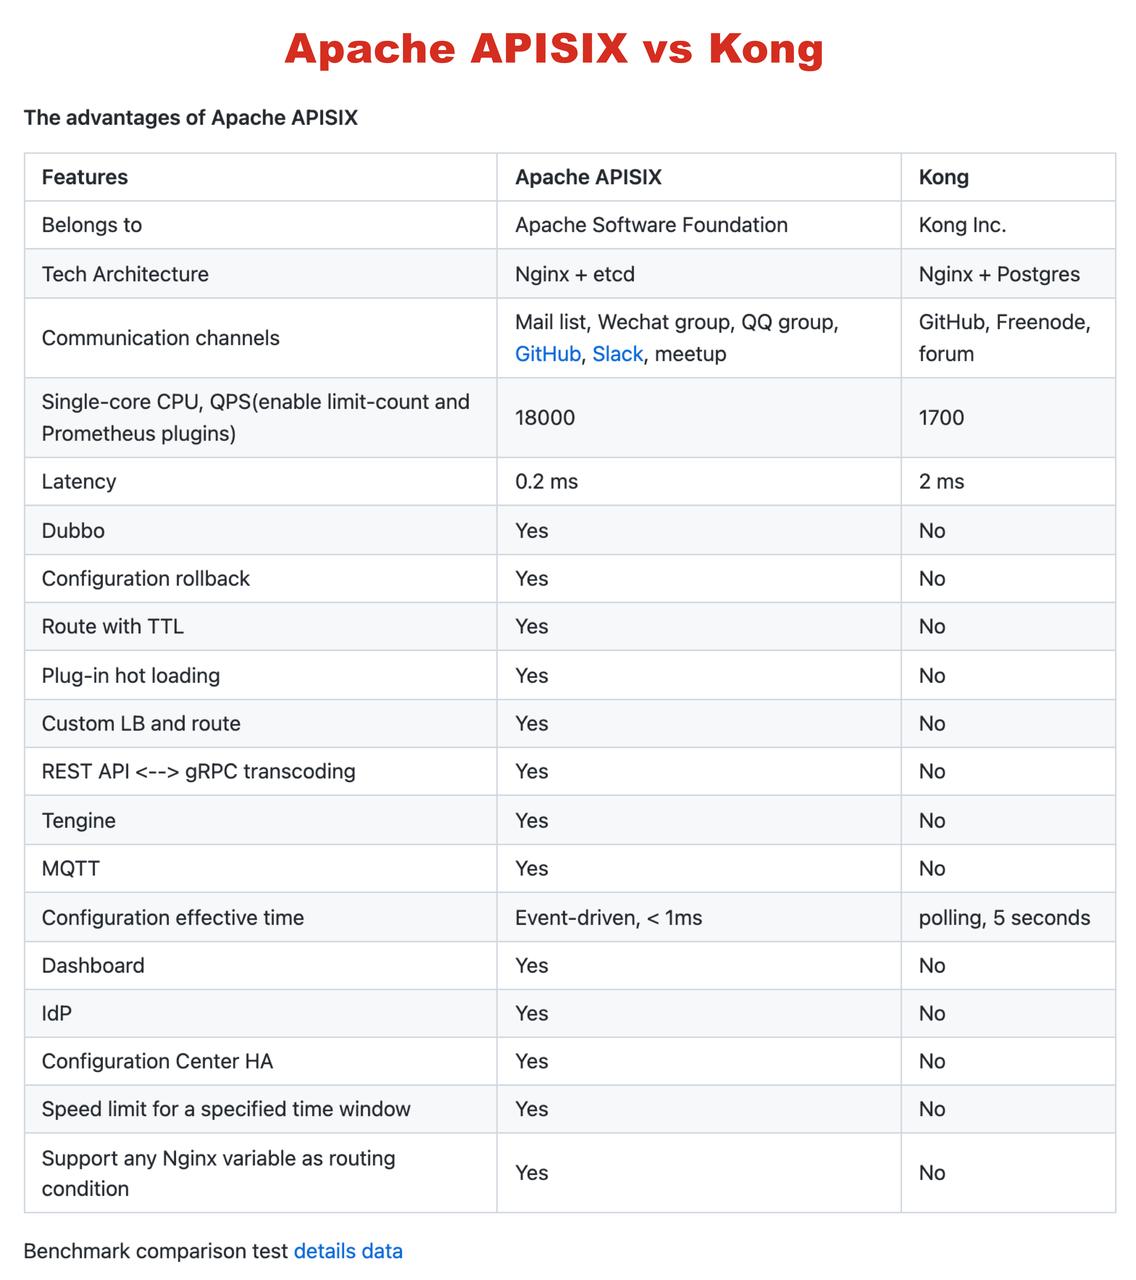 Apache APISIX 与 Kong 性能对比图